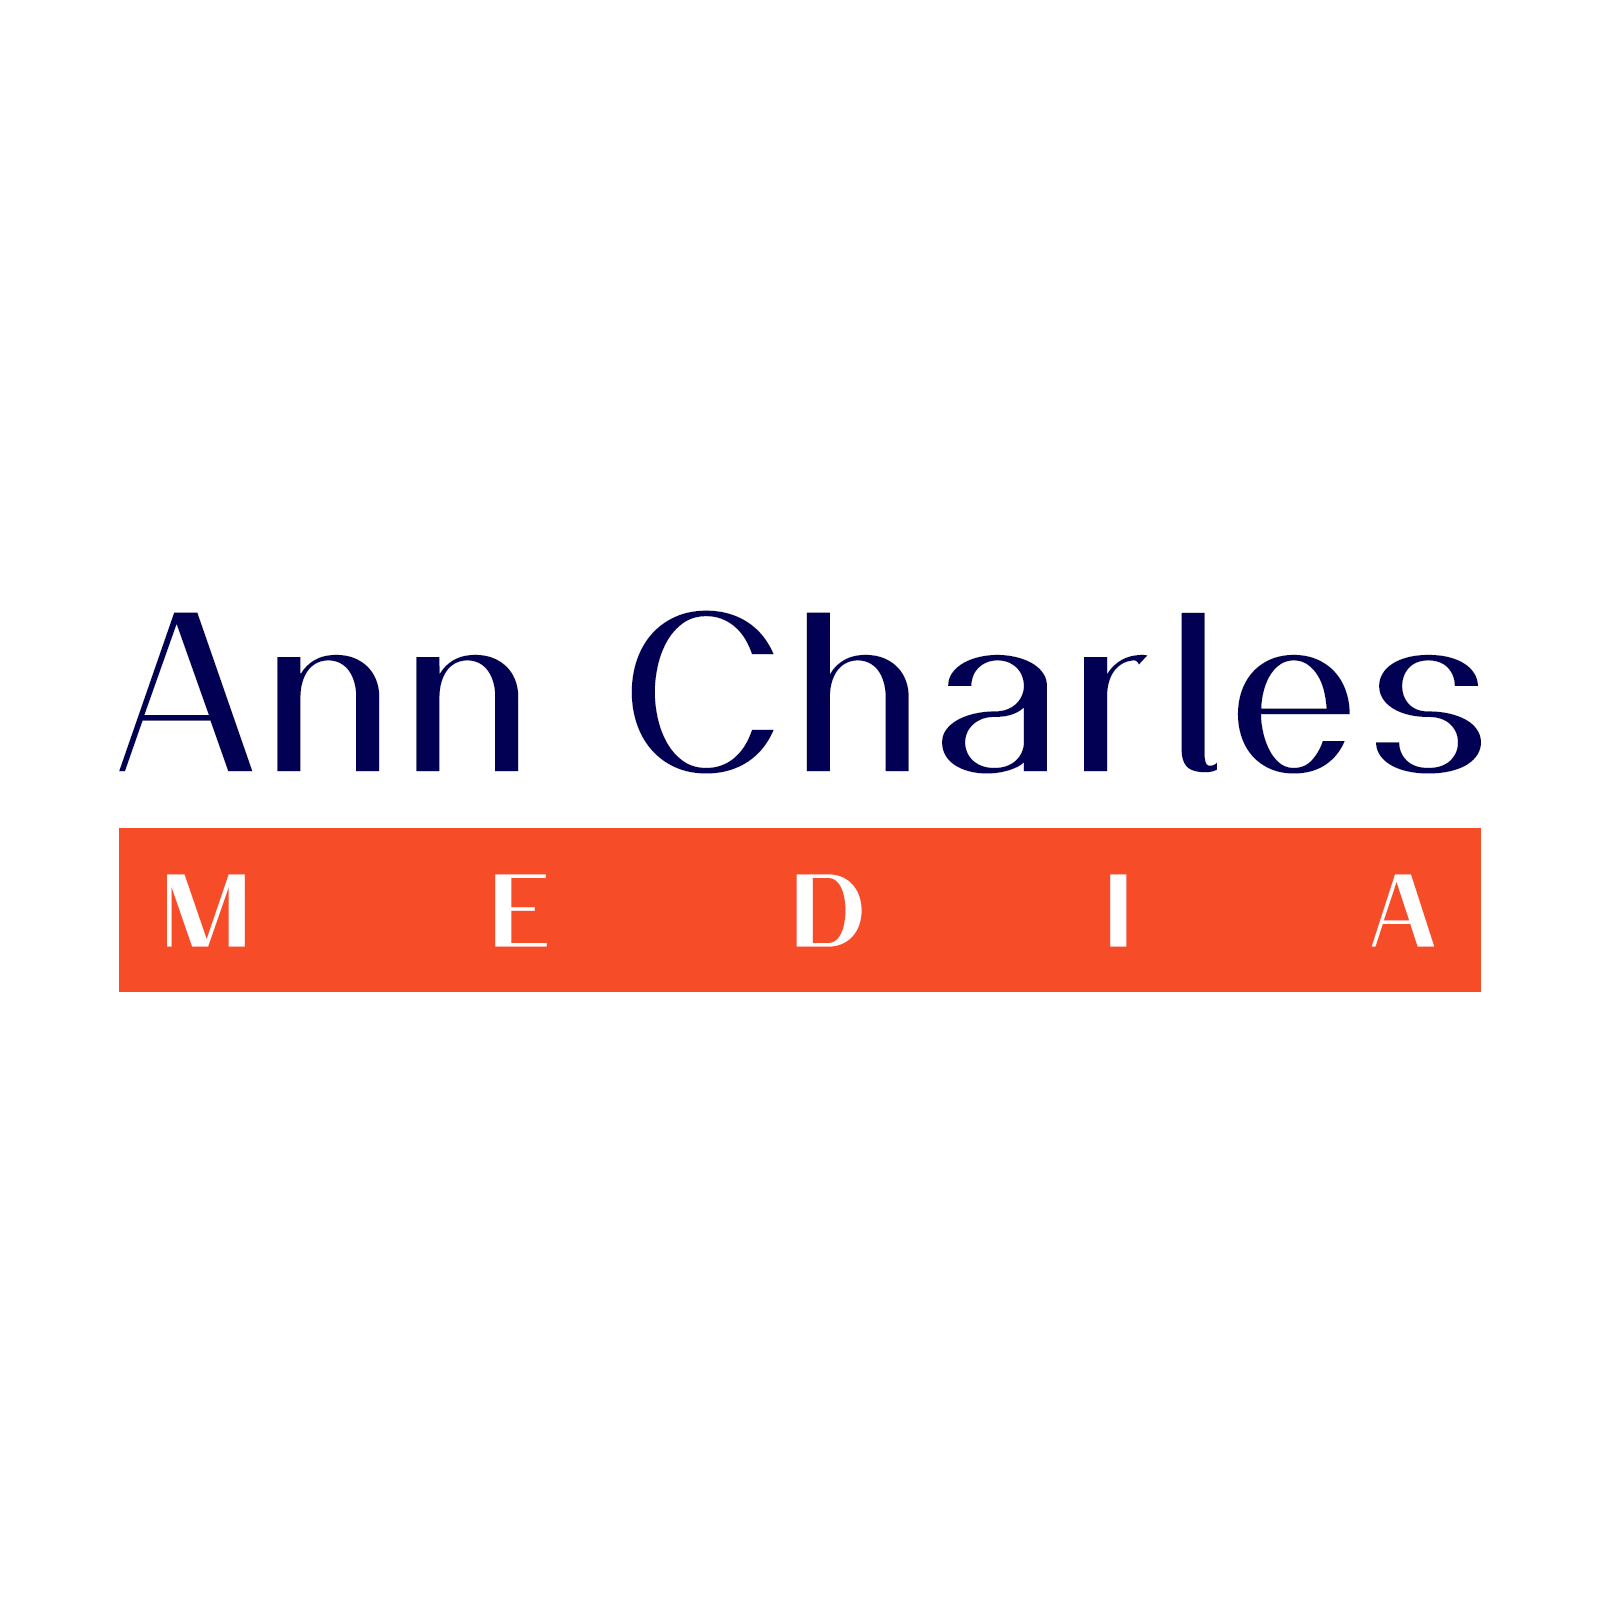 Ann Charles Media logo